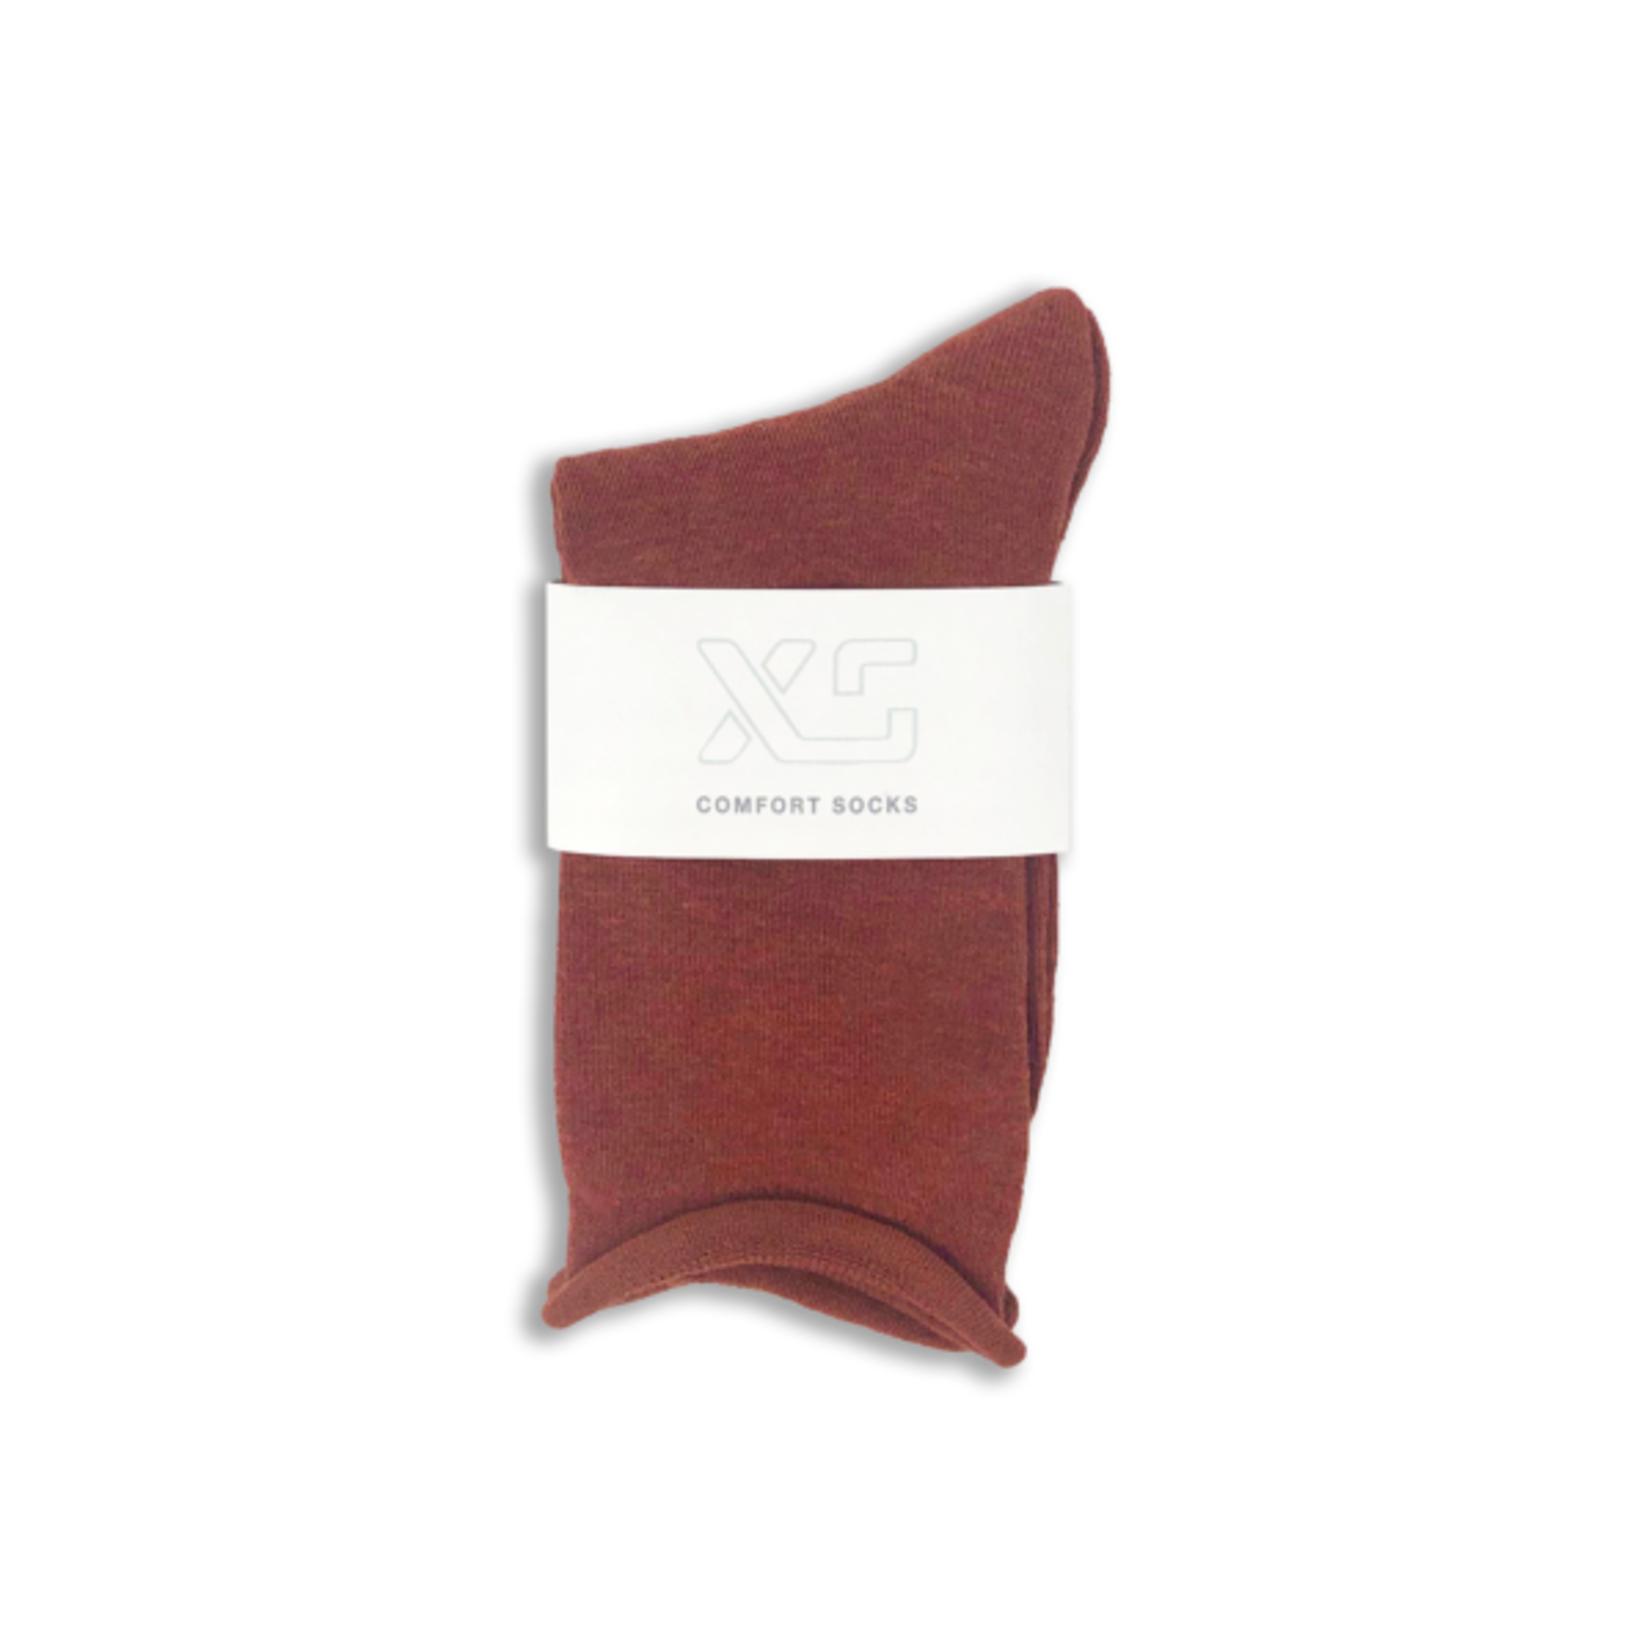 XS Unified XS Unified Comfort Socks